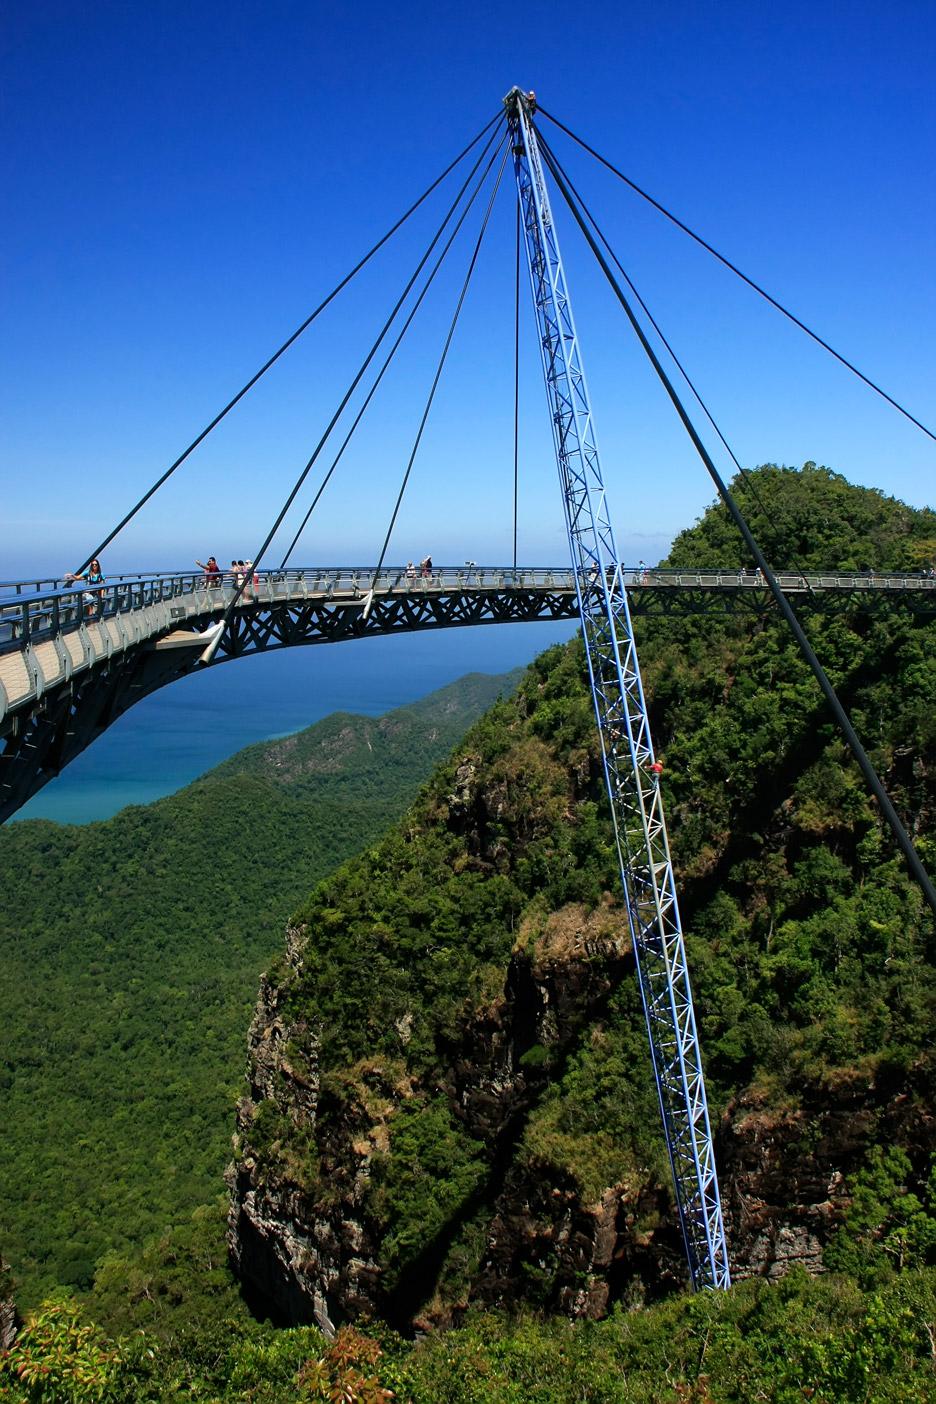 Langkawi Sky Bridge by Peter Wyss